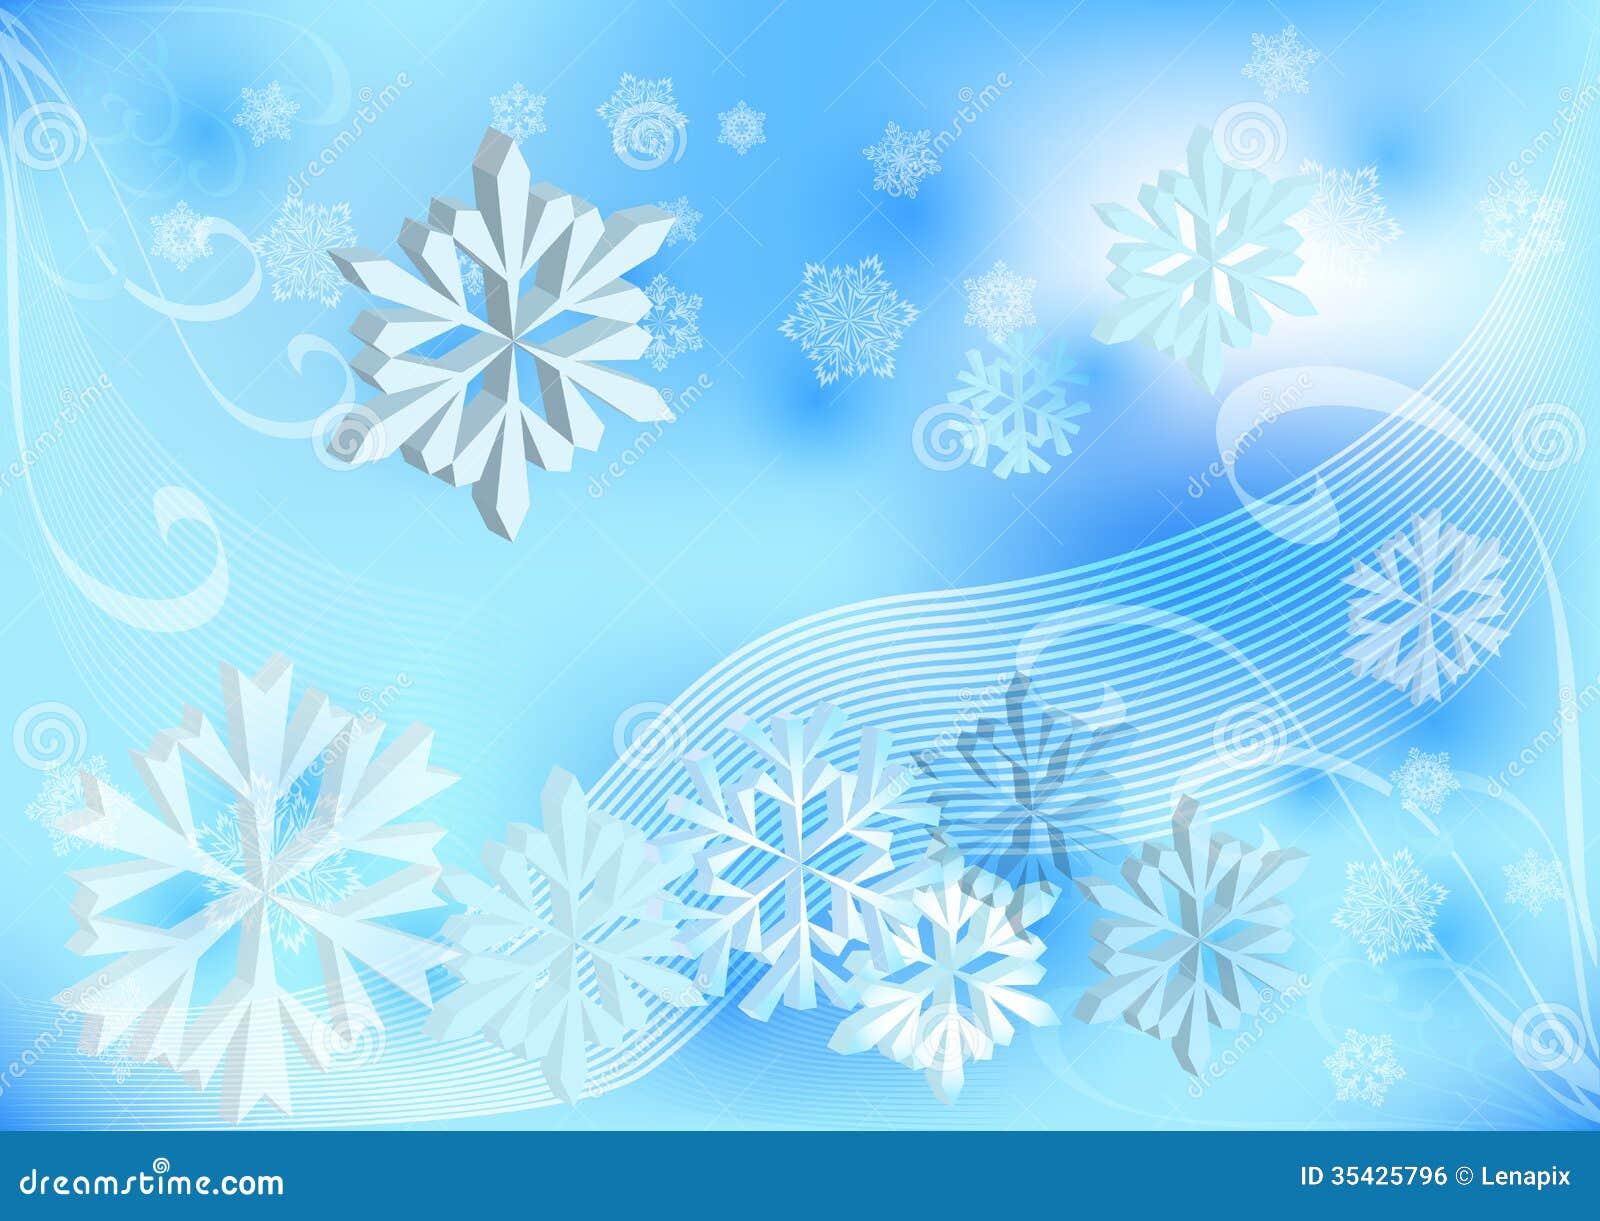 Winter Background Vector Free Vector Download 45 386 Free: Light Blue Winter Background Stock Vector